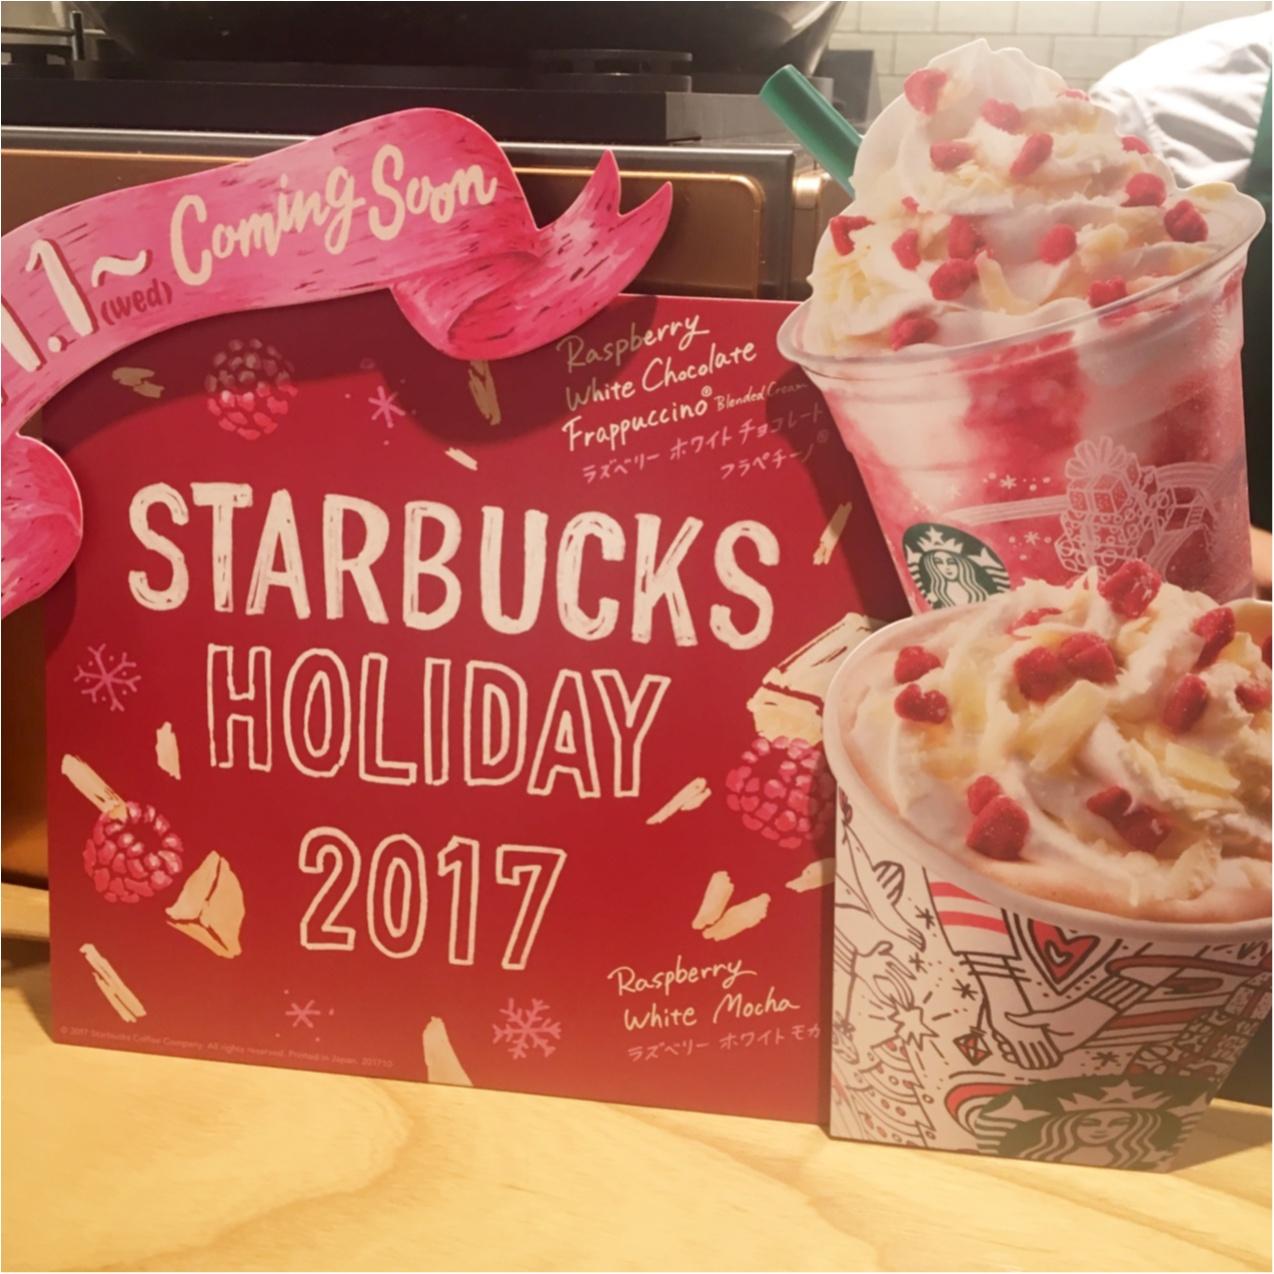 【STAR BUCKS】季節のおすすめ♪ 栗がたっぷりのマロンタルト♡ 11月からの新作ドリンク情報も要チェック♡♡_3